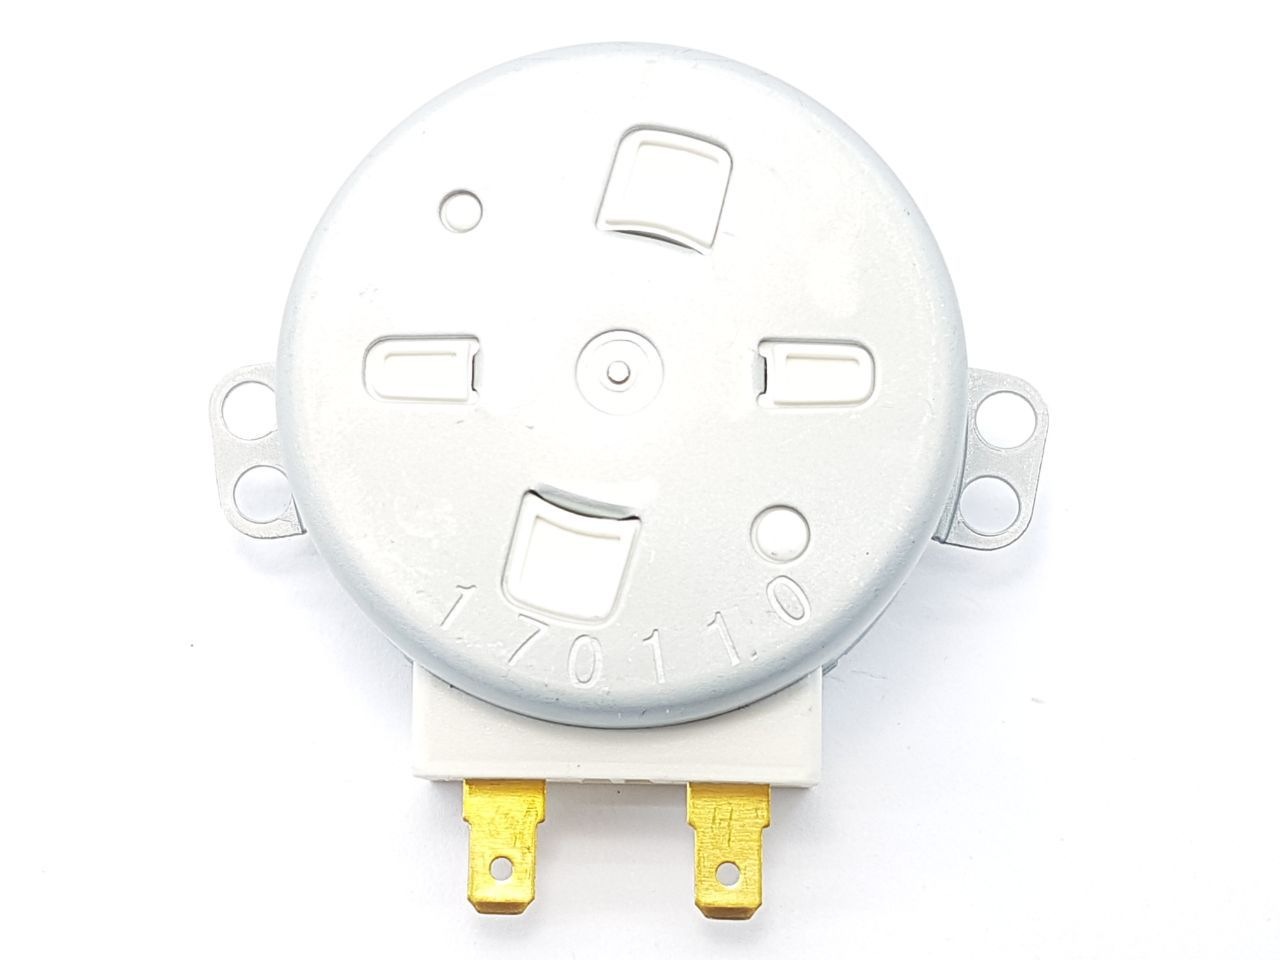 Motor Prato Microondas Electrolux 220v 64376907 Original